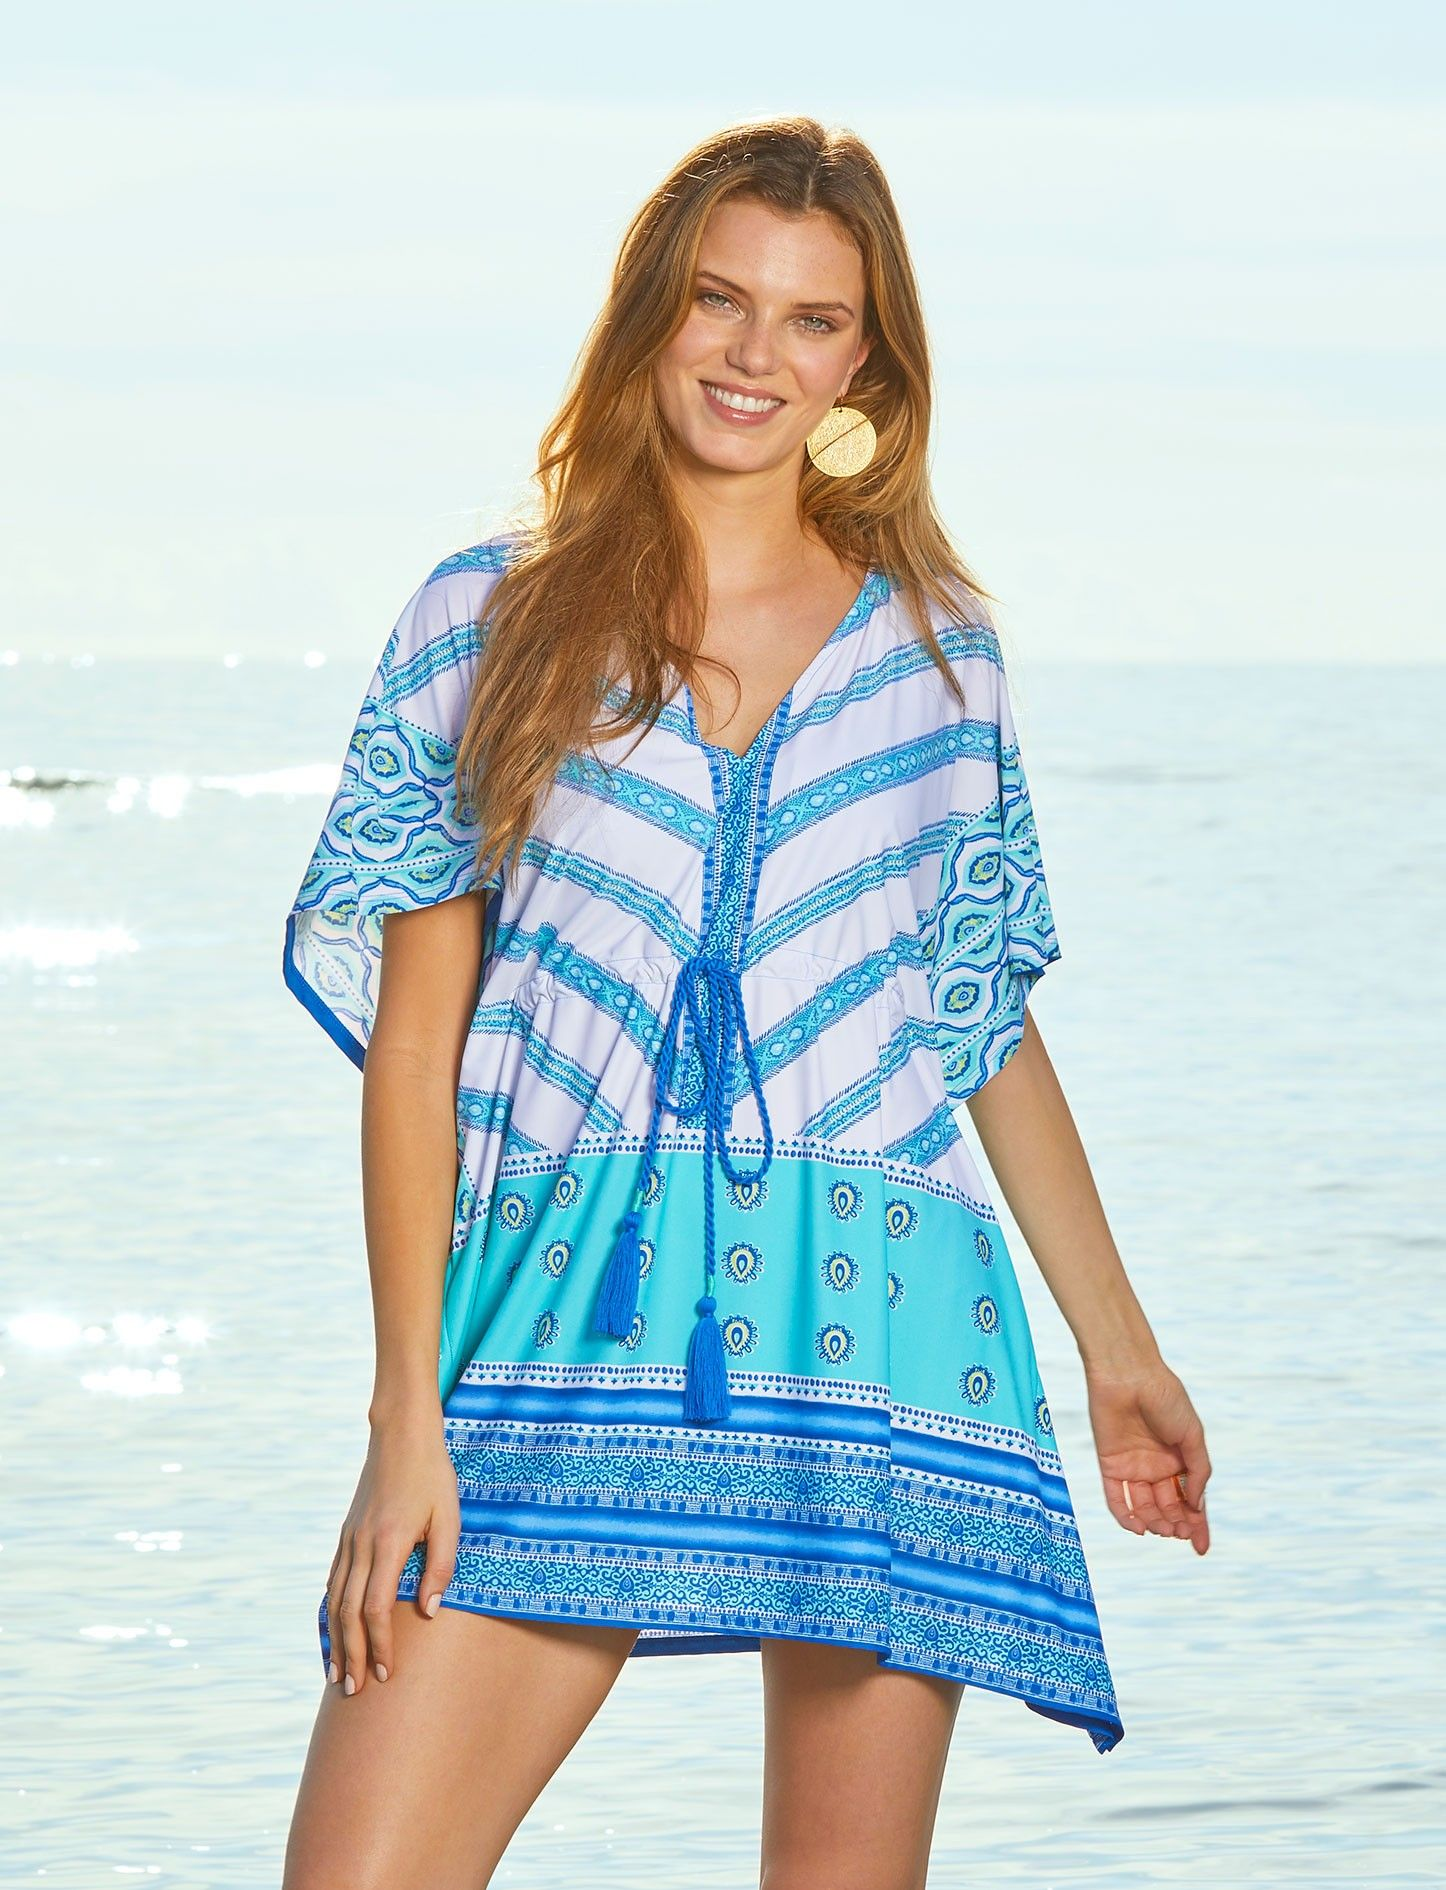 Cabana Life Bondi Beach Tie Waist Cover Up 50 Uv Protection Upf Clothing